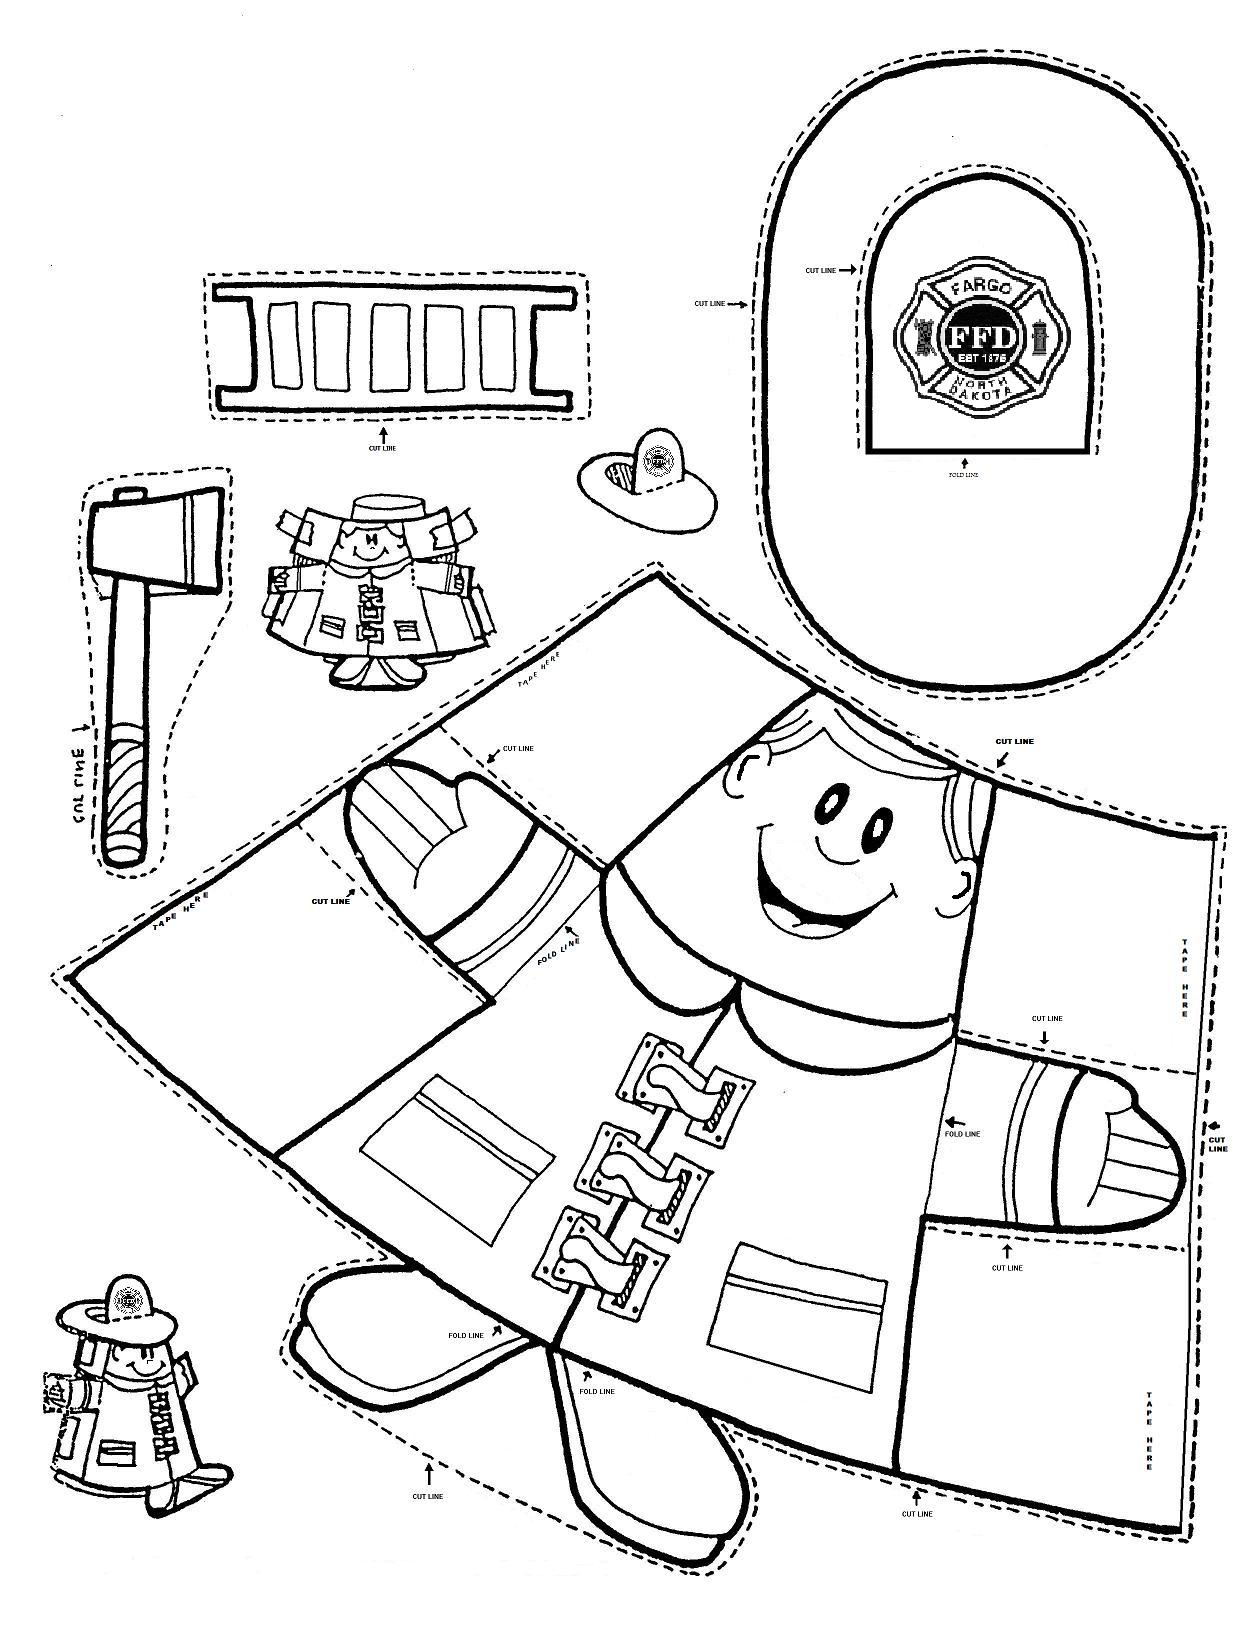 Free Drawing Printouts At Getdrawings